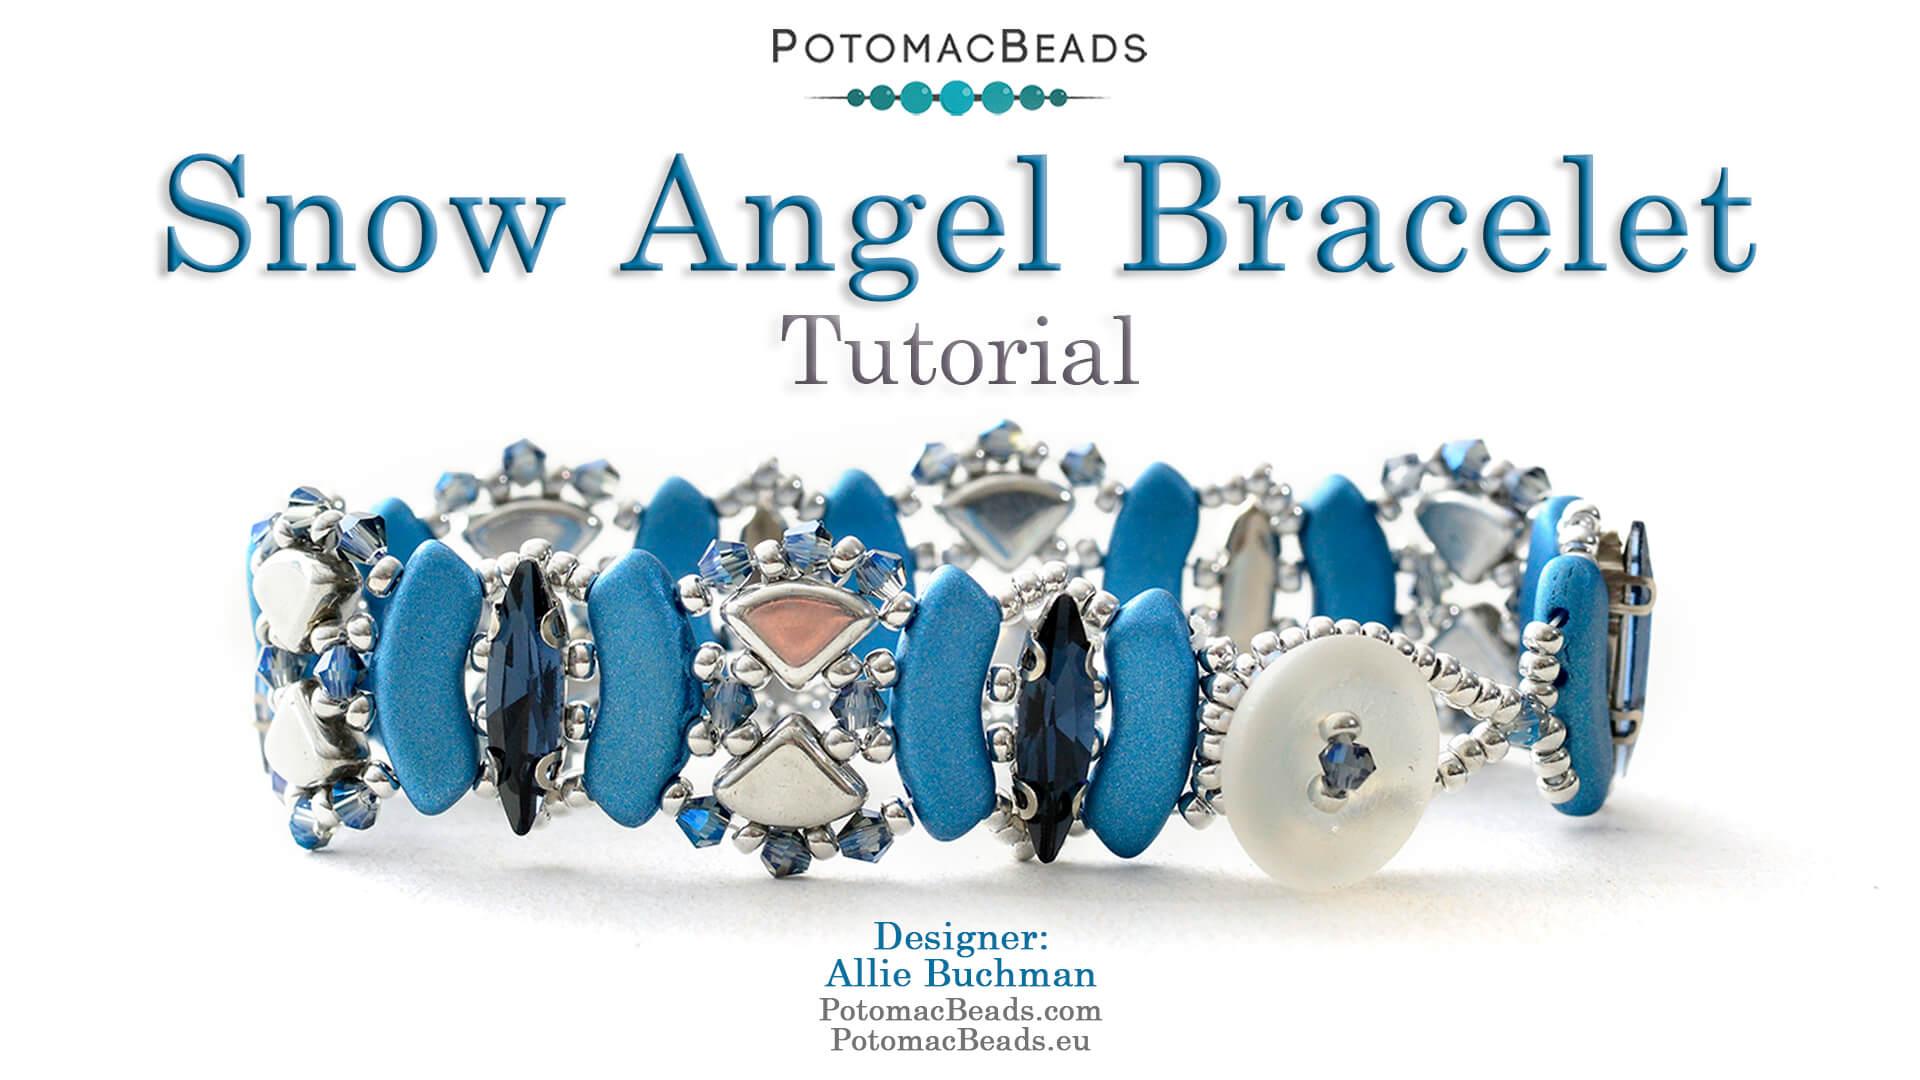 How to Bead / Videos Sorted by Beads / QuadBow & PieDuo Bead Videos / Snow Angel Bracelet Tutorial